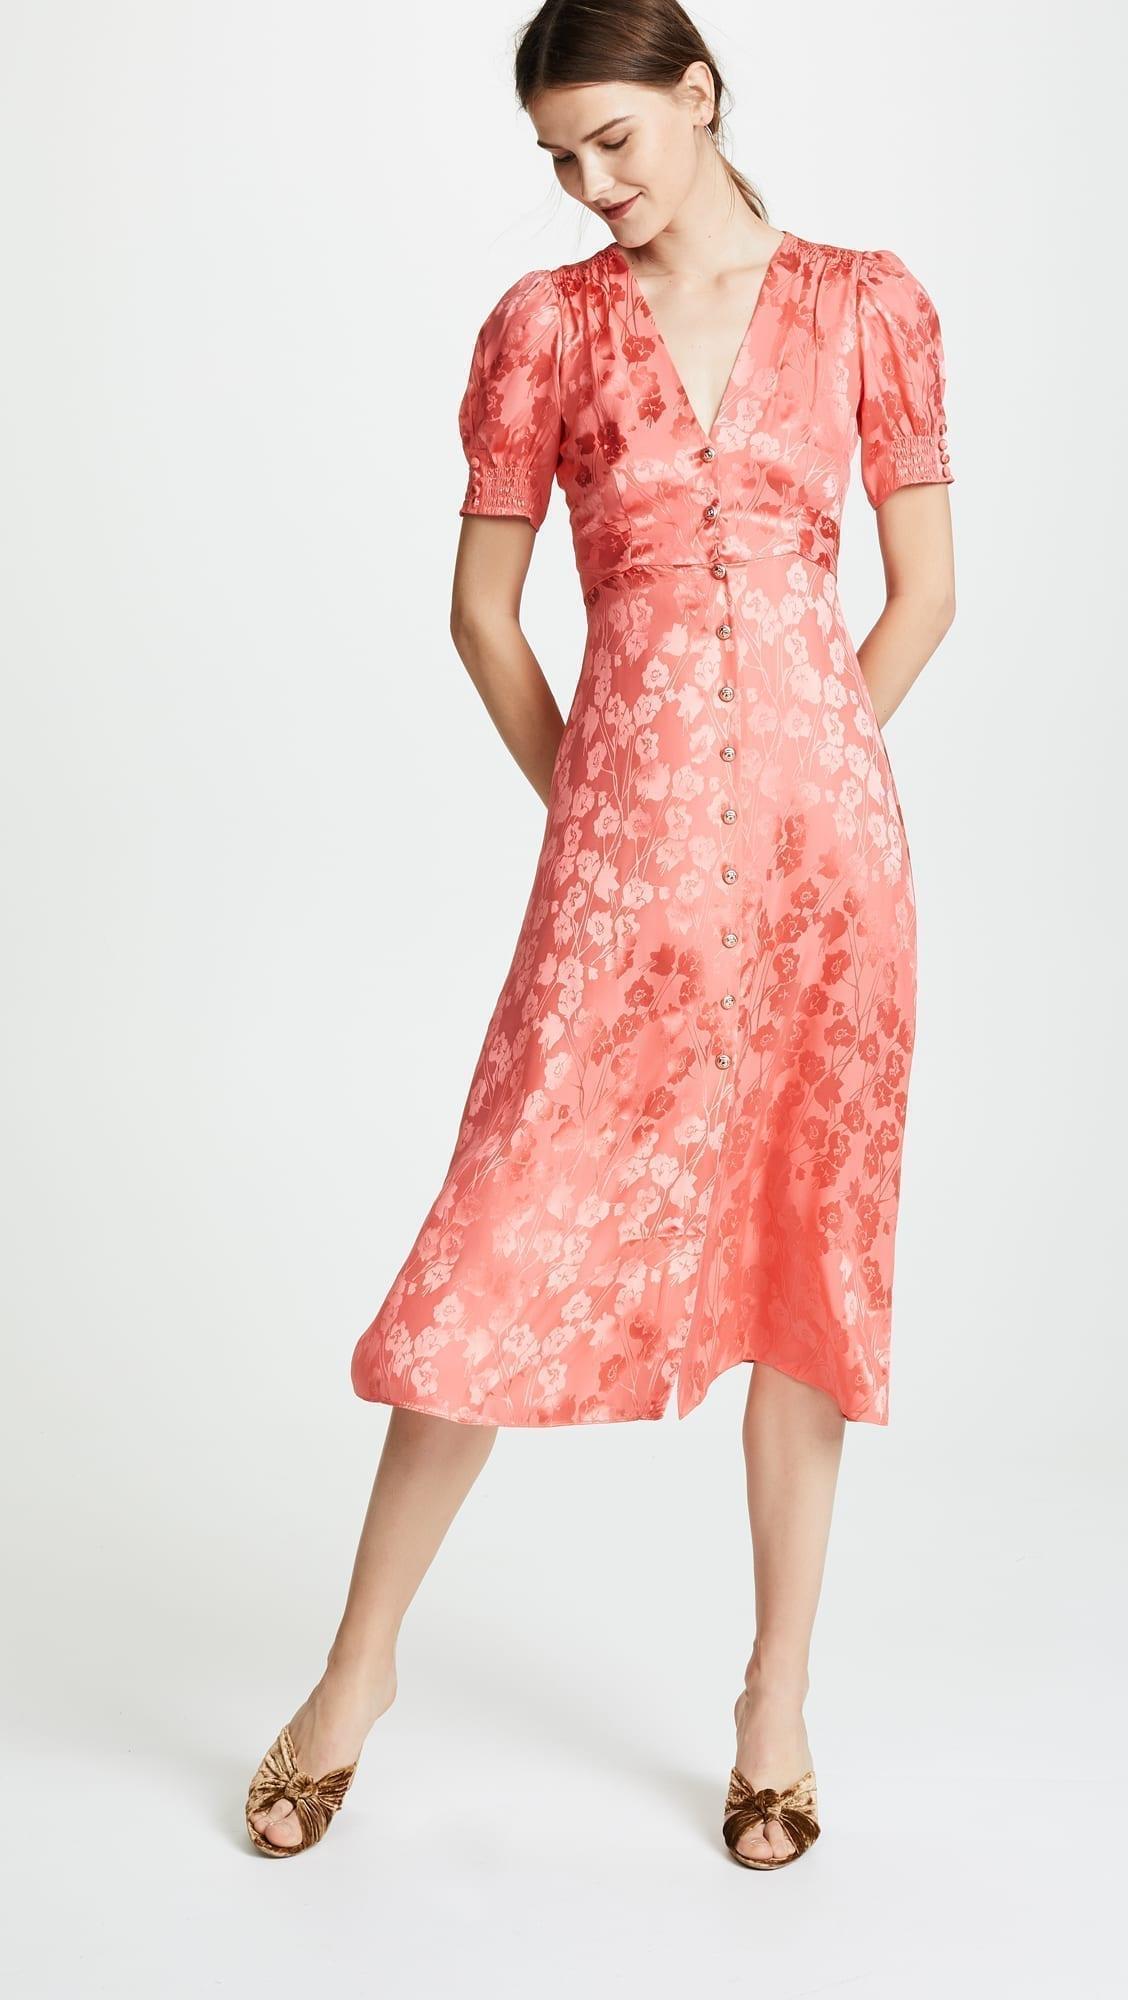 V Neck Color Block Long Sleeve Sheath Dress retail stores online brands